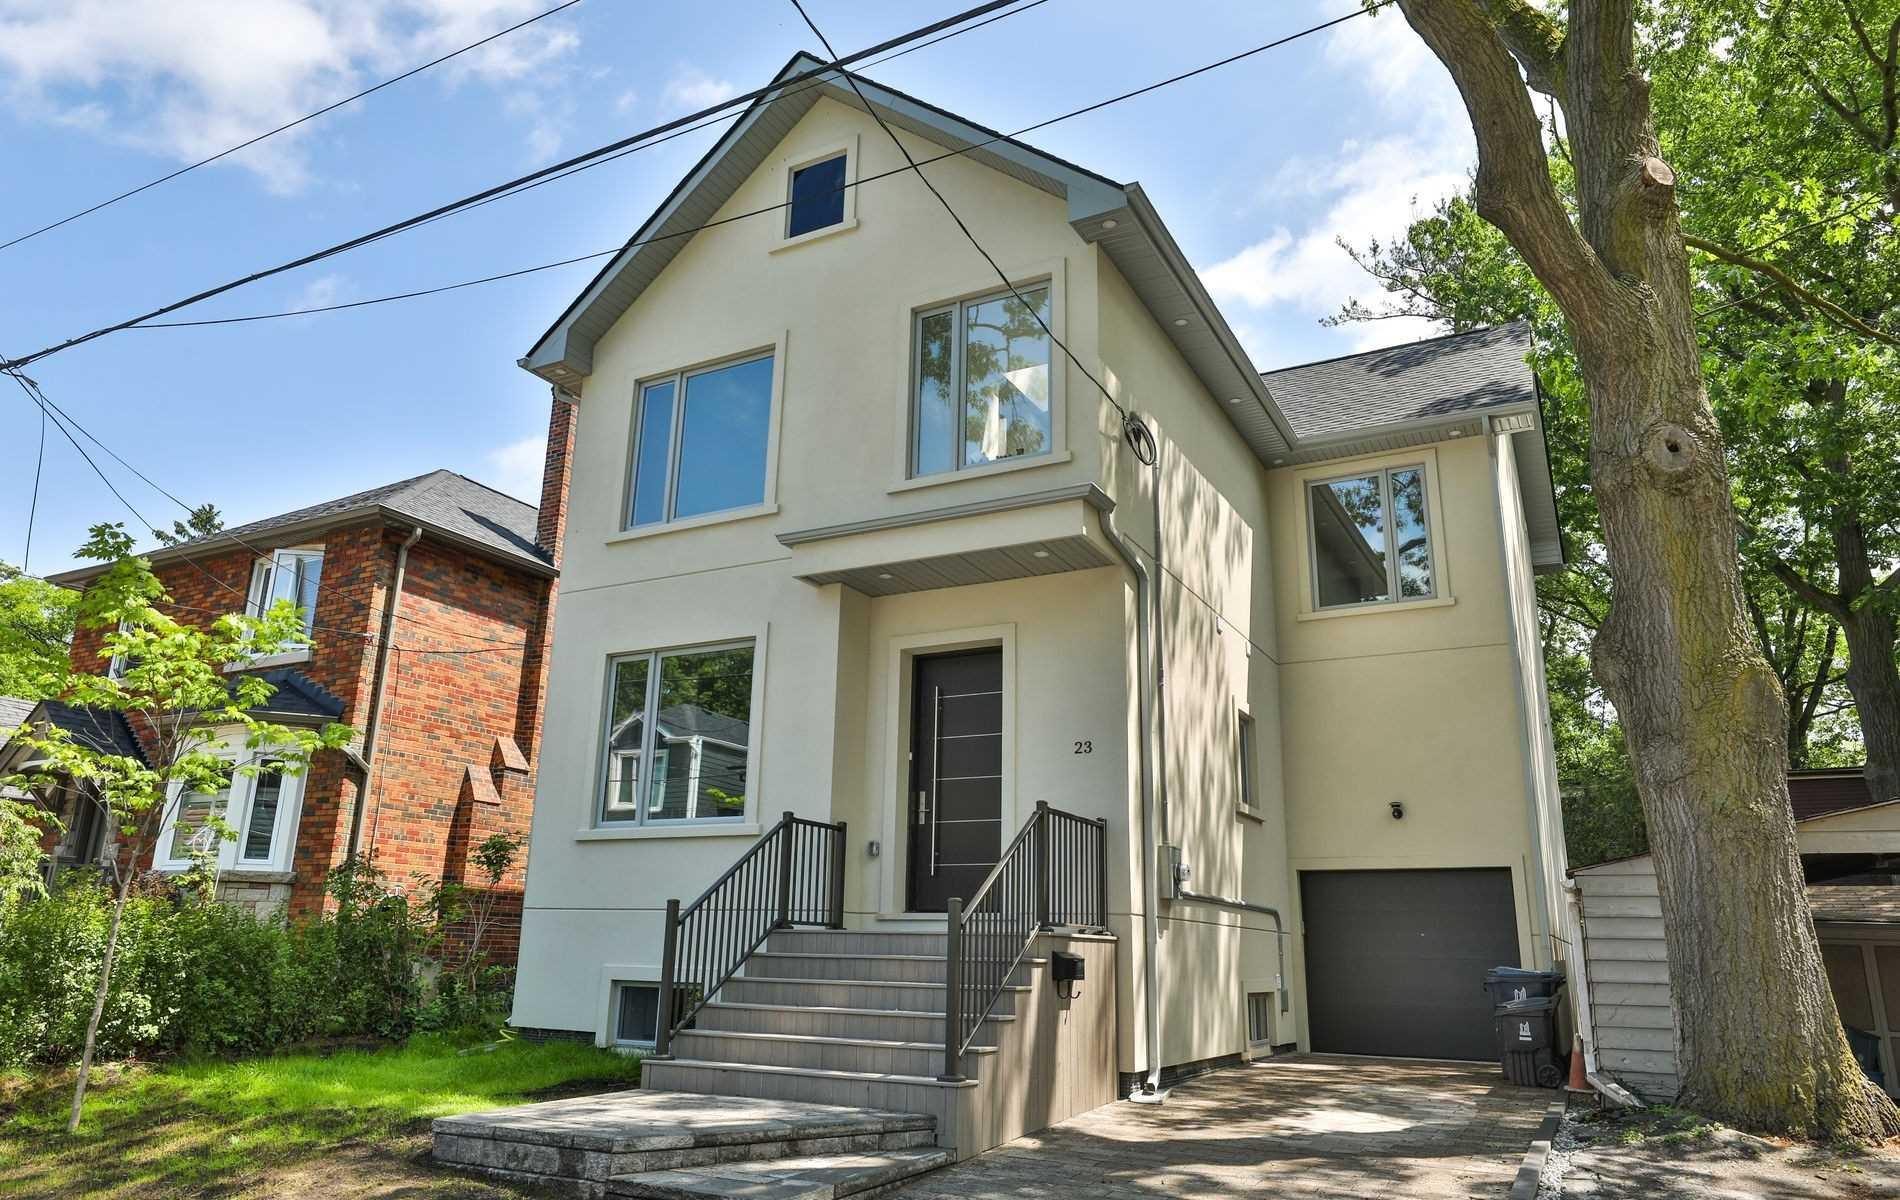 23 Haig Ave, Toronto, Ontario M1N 2W2, 4 Bedrooms Bedrooms, 9 Rooms Rooms,5 BathroomsBathrooms,Detached,For Sale,Haig,E5321870